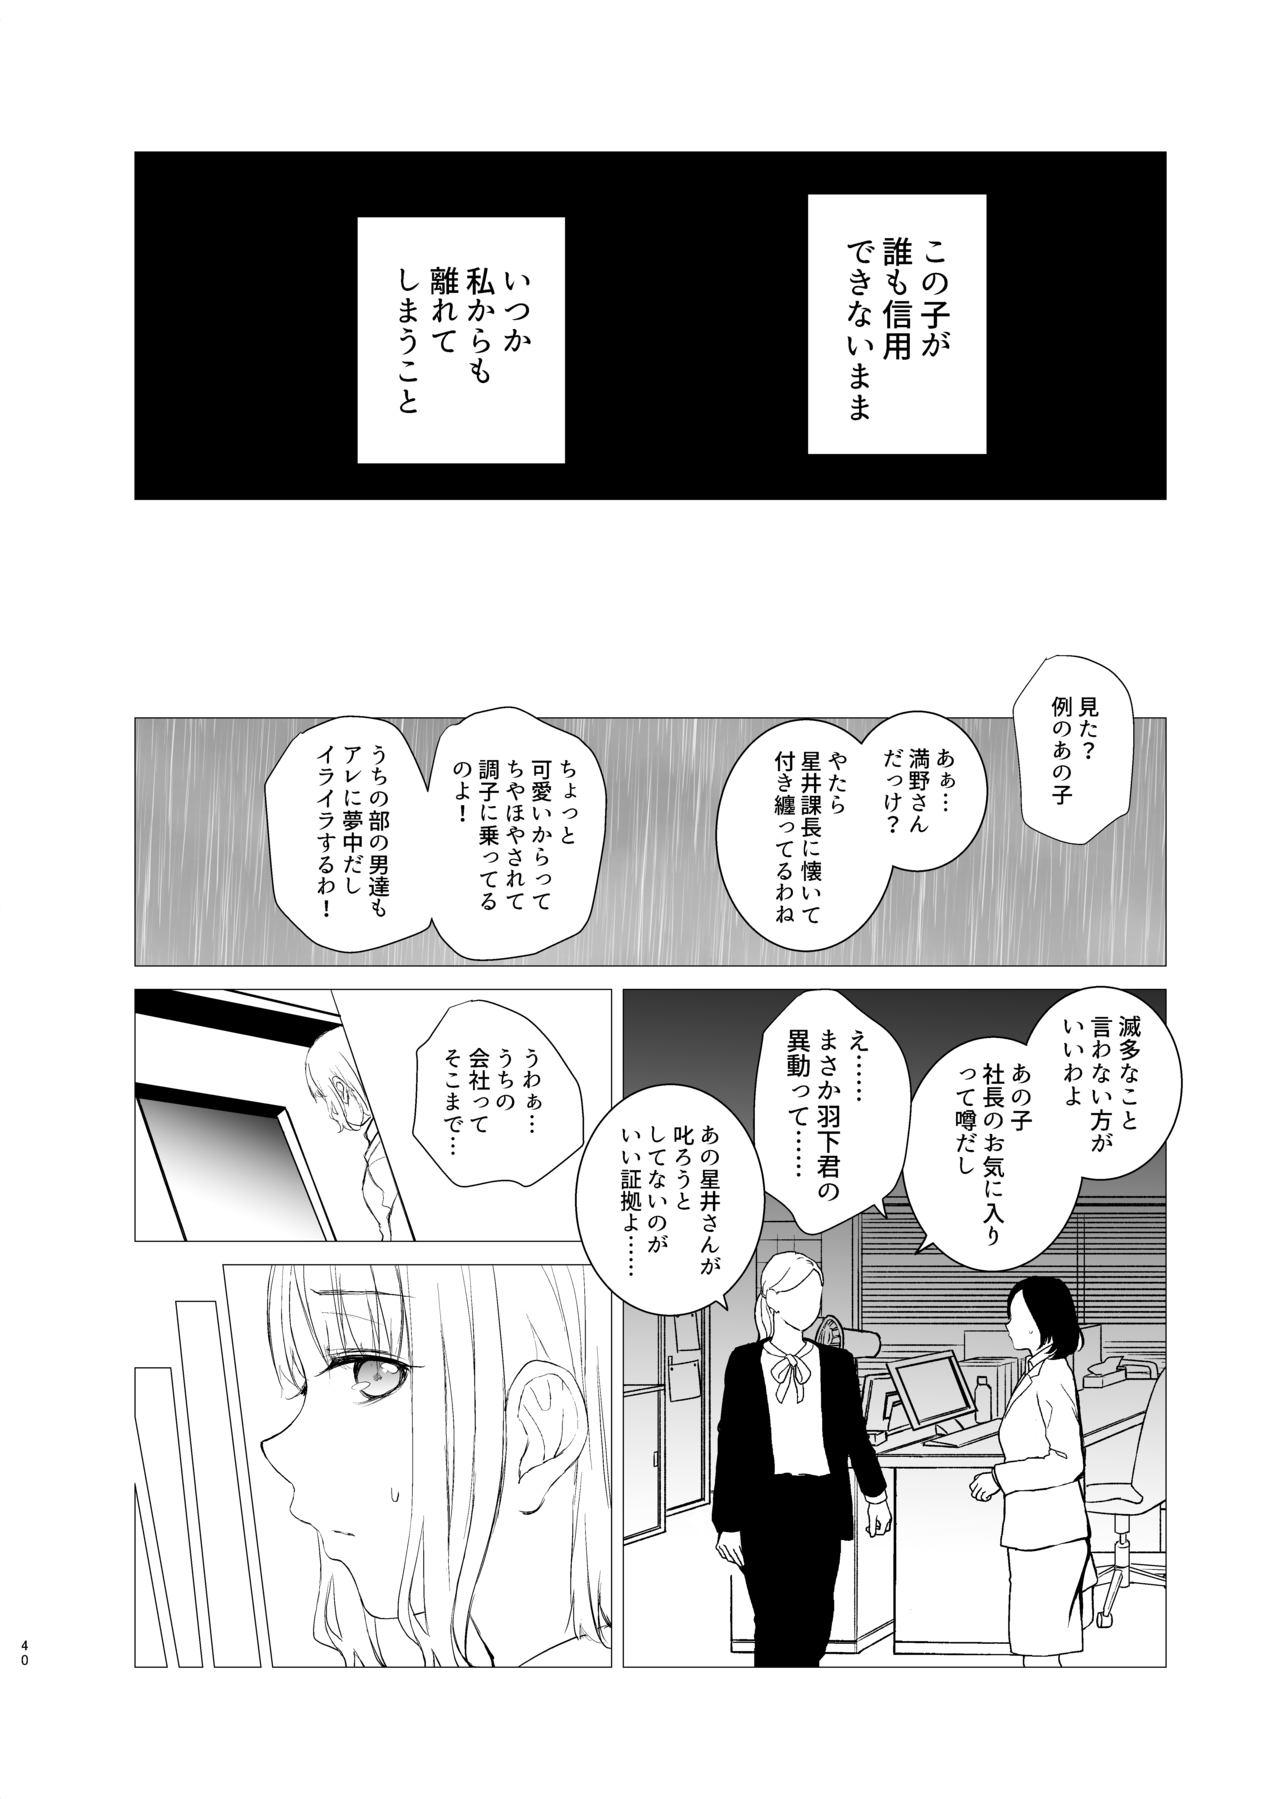 Hanayomi no Makurakotoba 38